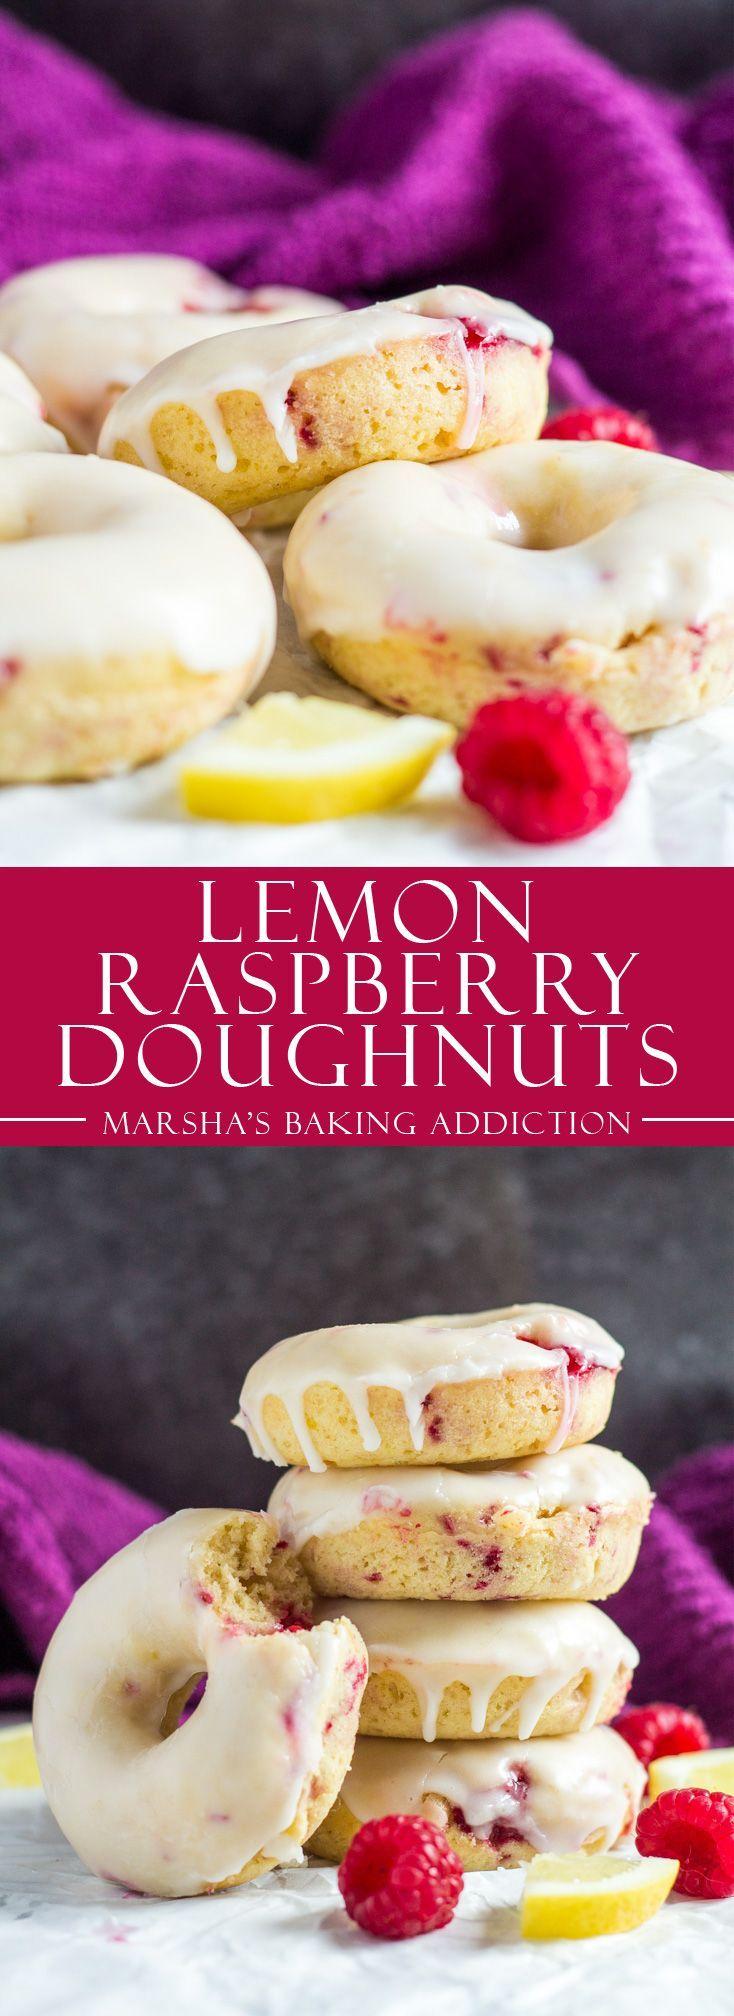 Baked Lemon Raspberry Doughnuts | Marsha's Baking Addiction